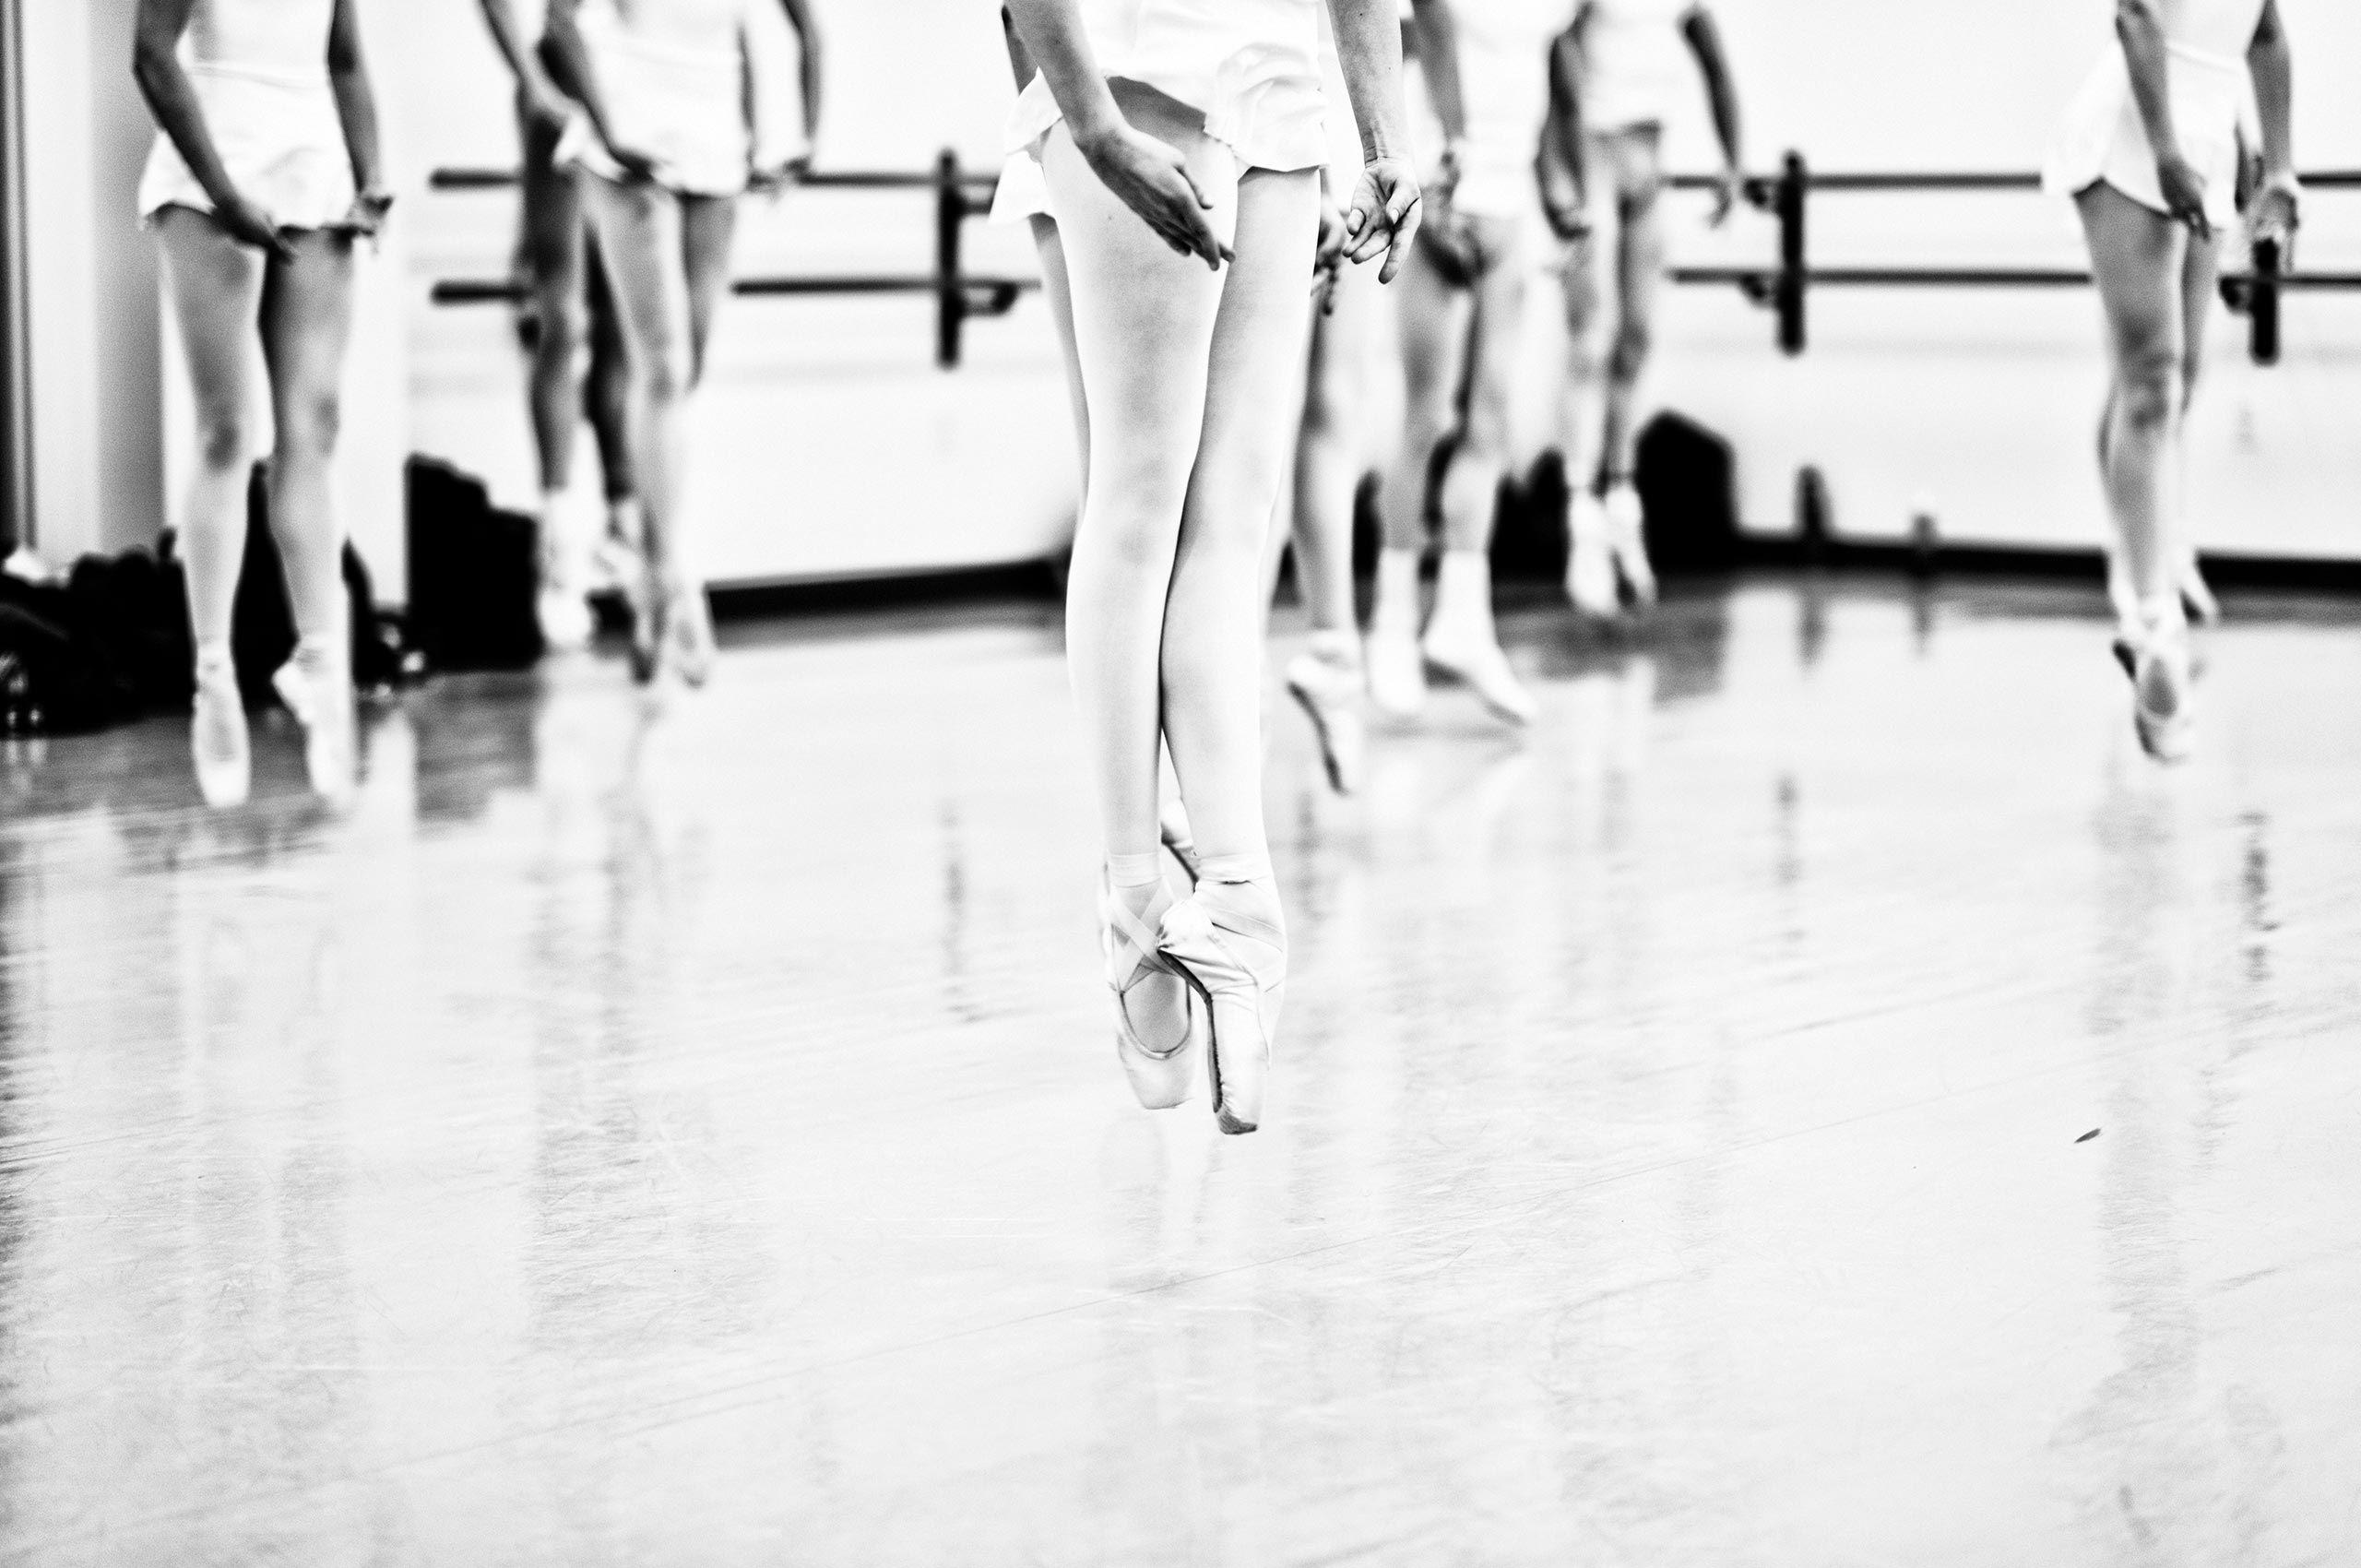 ballerinas-jumpiung-HenrikOlundPhotography.jpg